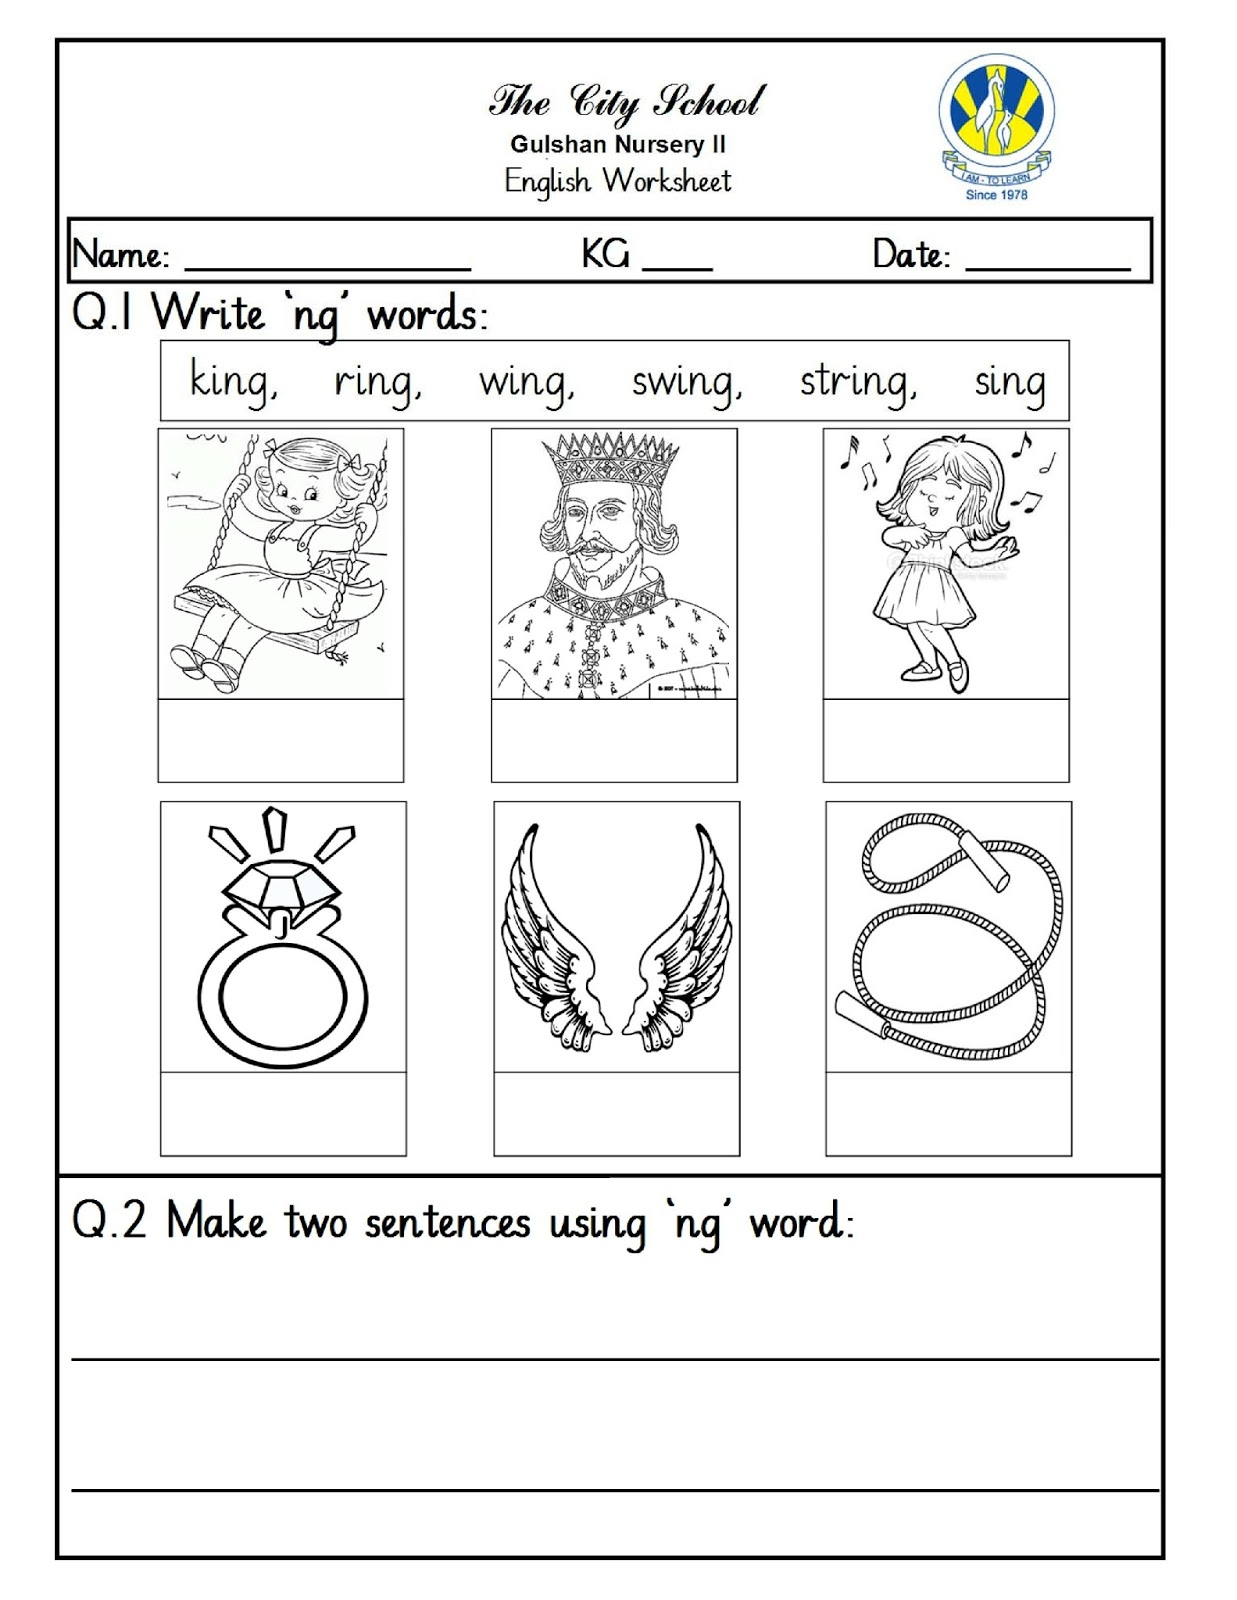 SR Gulshan The City Nursery-II: English and Math Worksheets